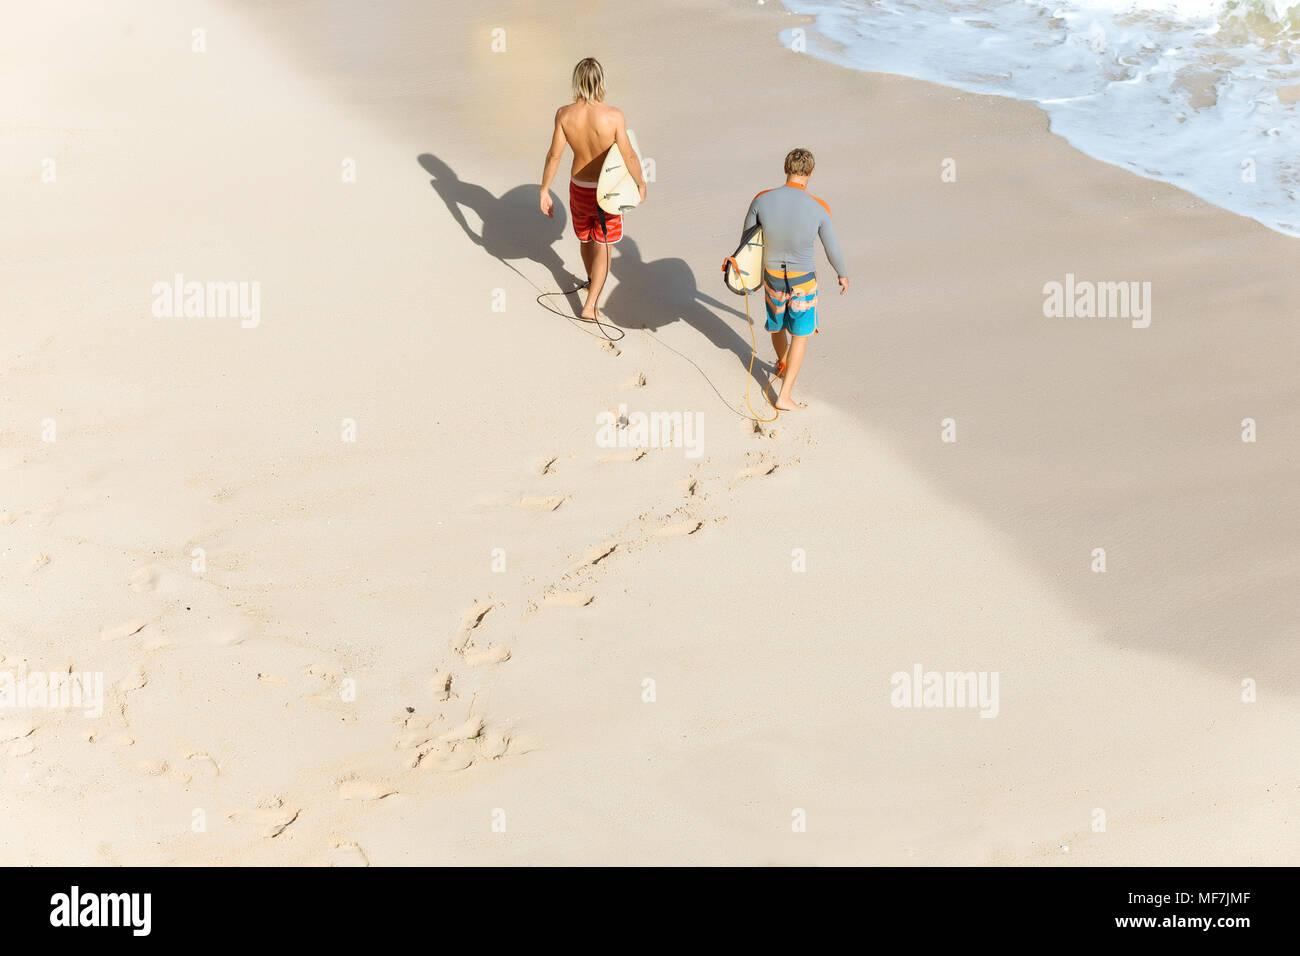 Indonesia, Bali, Surfers walking aat Bingin beach - Stock Image